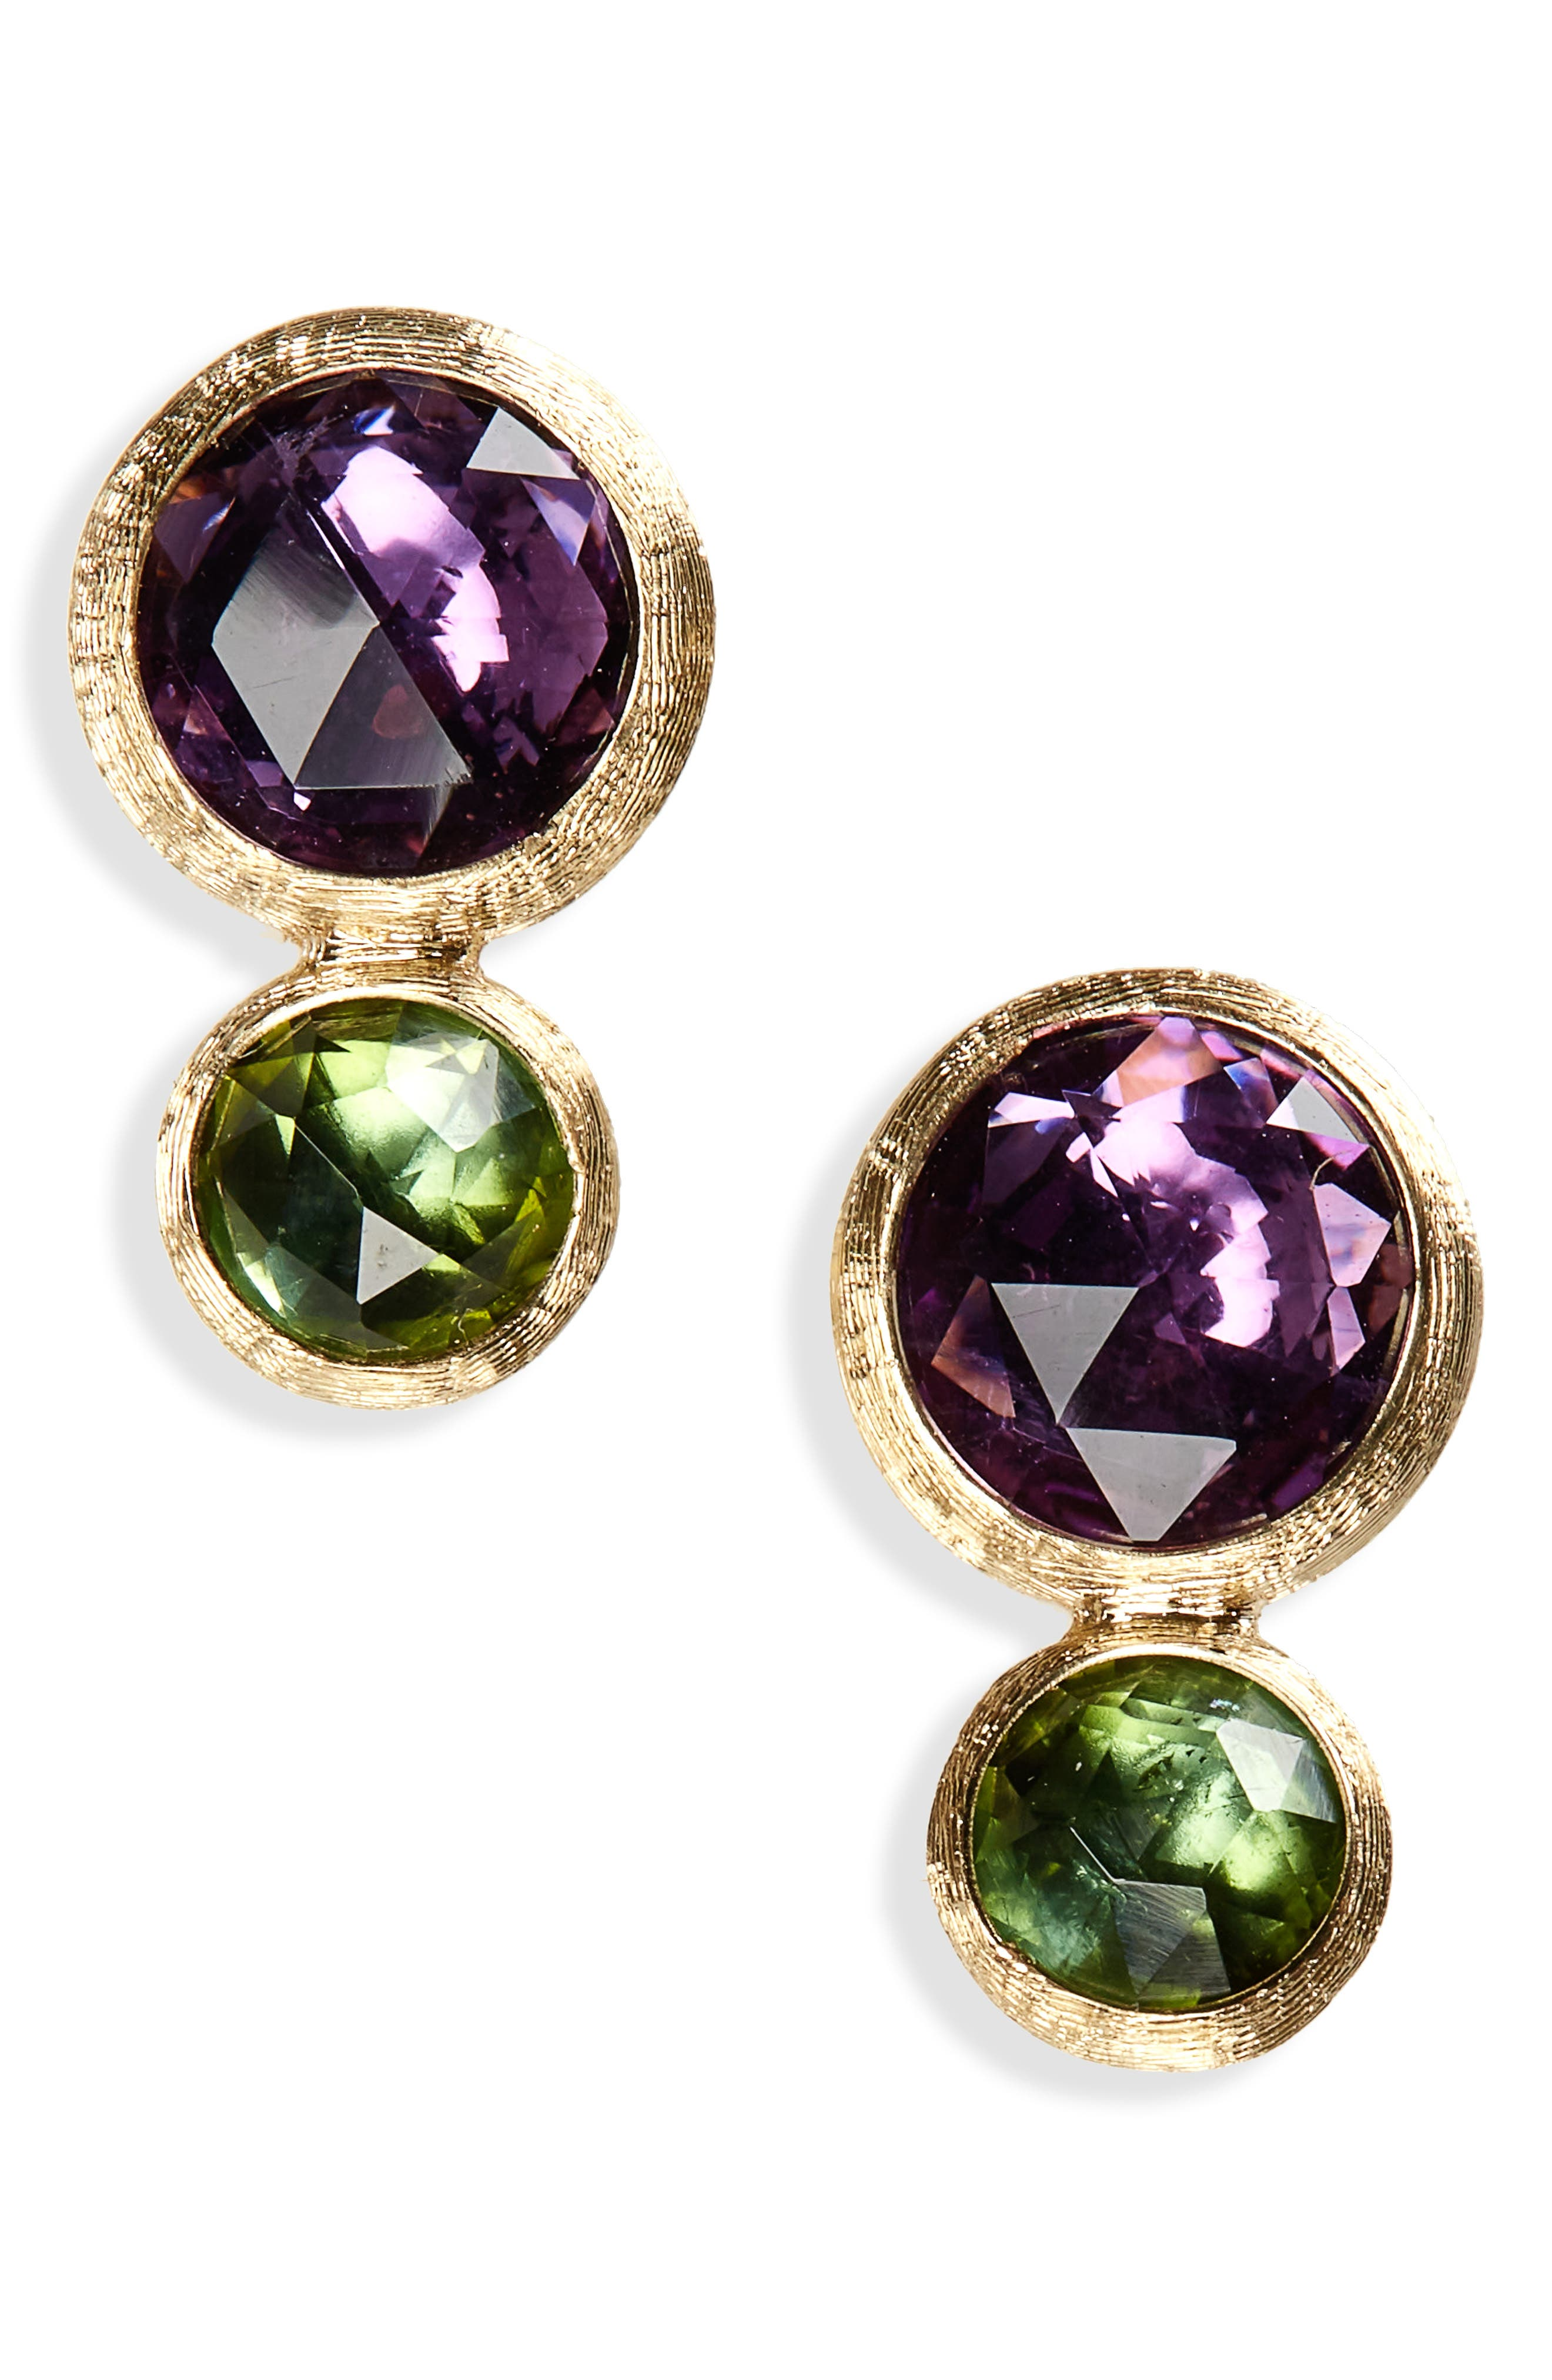 Jaipur Amethyst & Tourmaline Stud Earrings,                             Main thumbnail 1, color,                             Yello Gold/ Amethyst